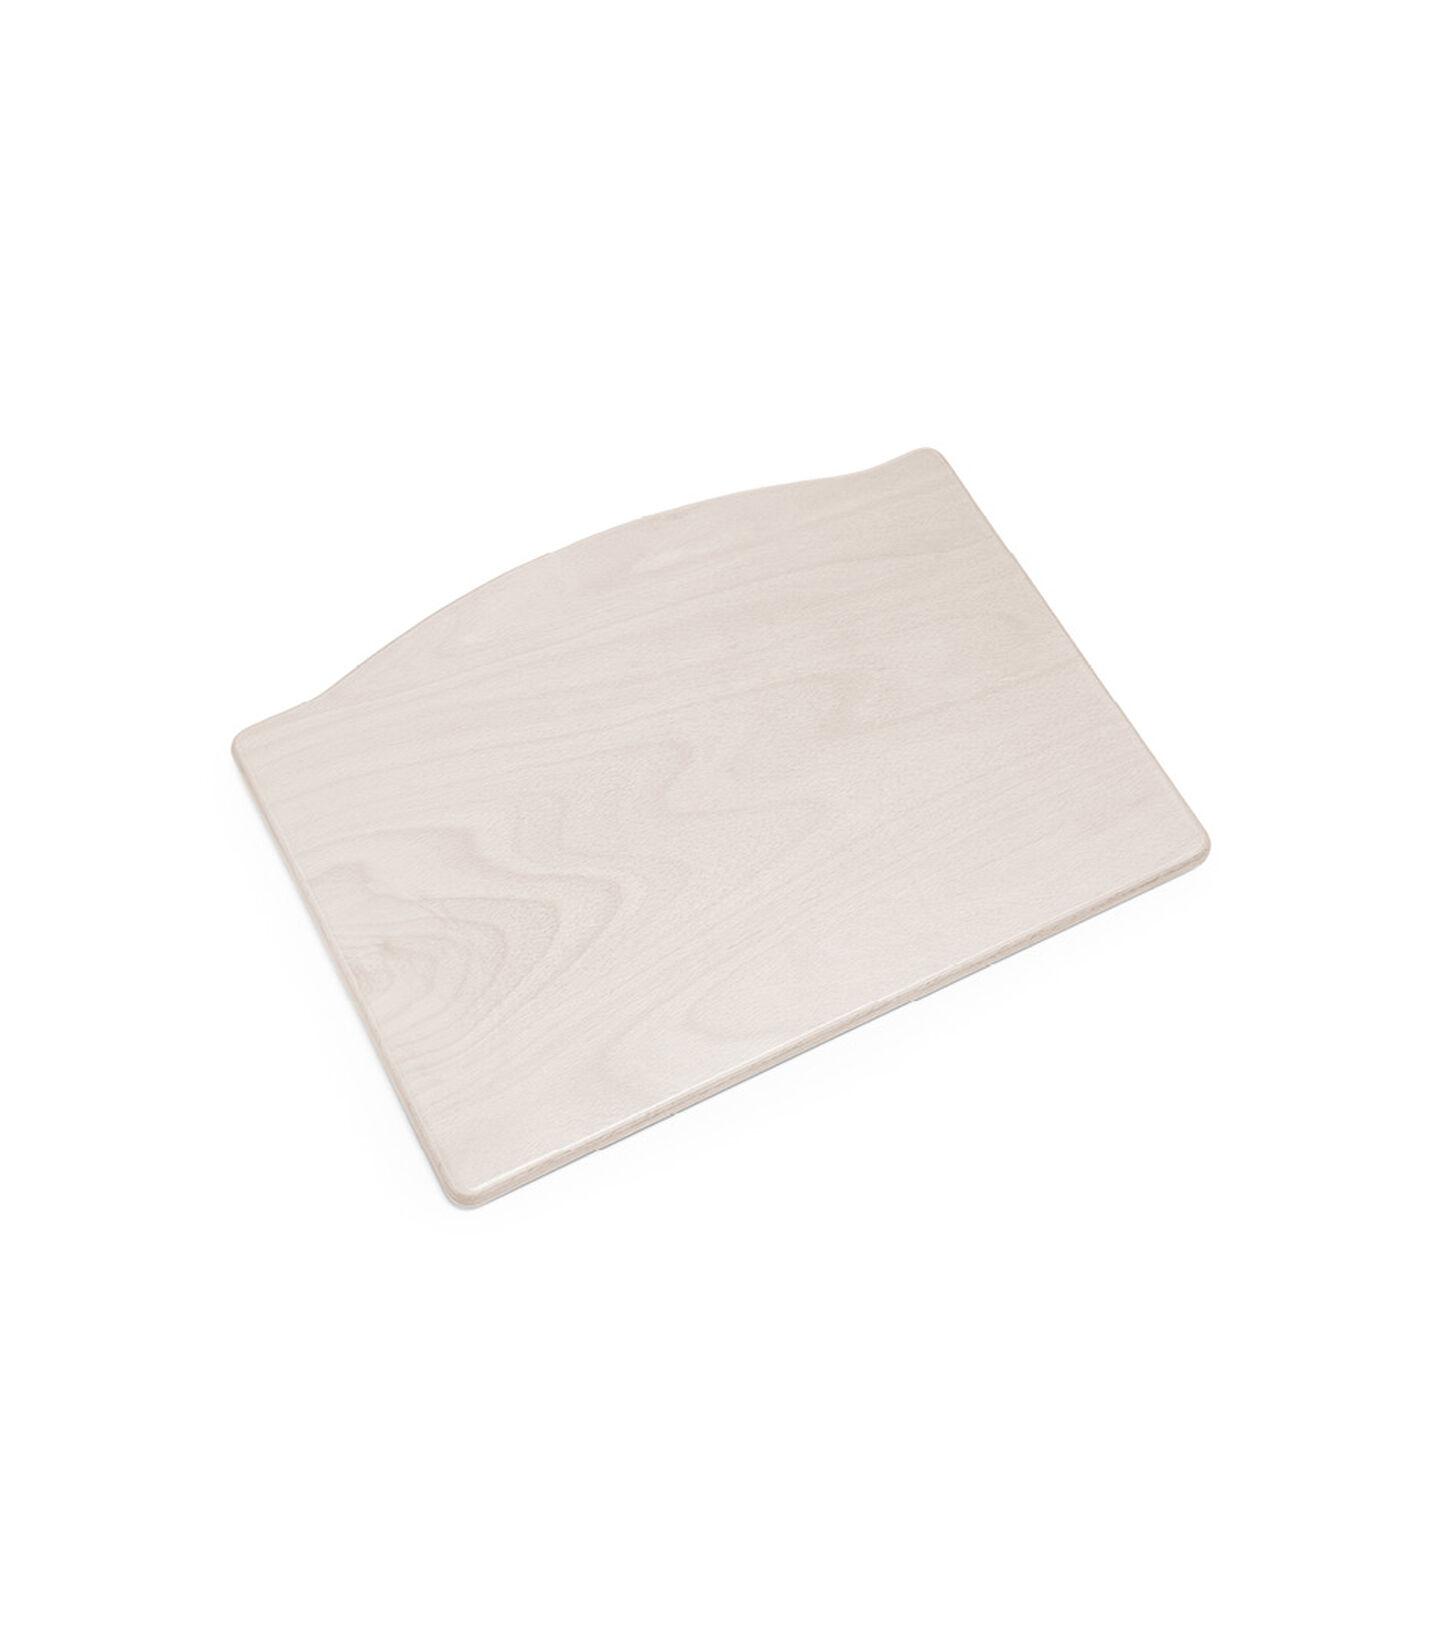 108905 Tripp Trapp Foot plate Whitewash (Spare part). view 2